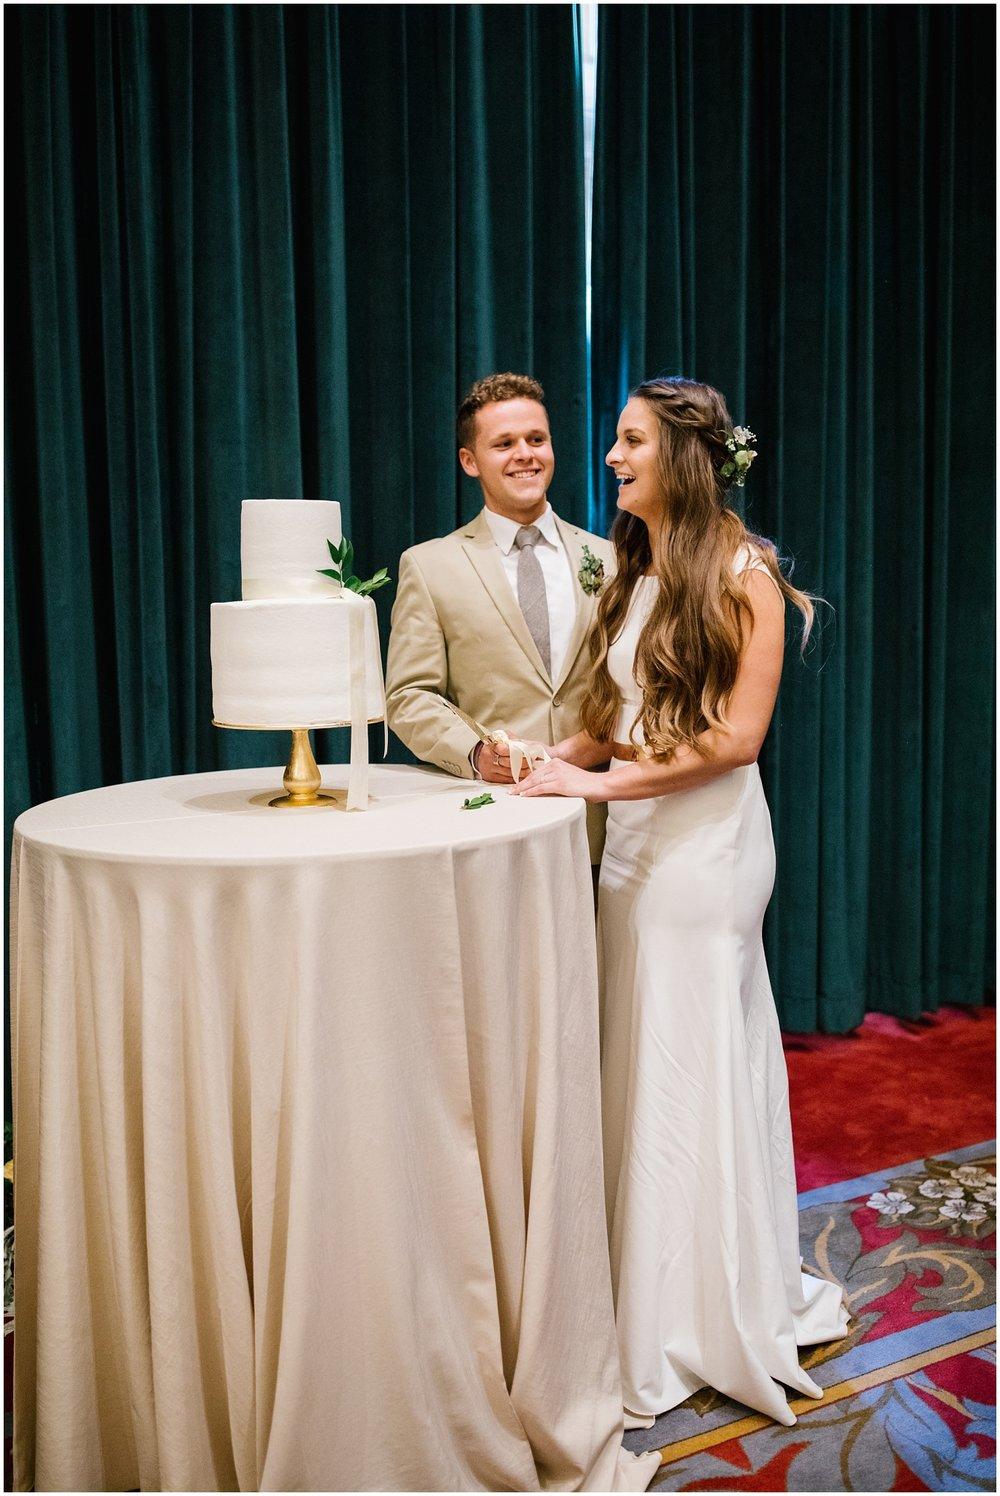 JC-Wedding-355_Lizzie-B-Imagery-Utah-Wedding-Photographer-Park-City-Salt-Lake-City-Temple-Joseph-Smith-Memorial-Building-Empire-Room.jpg